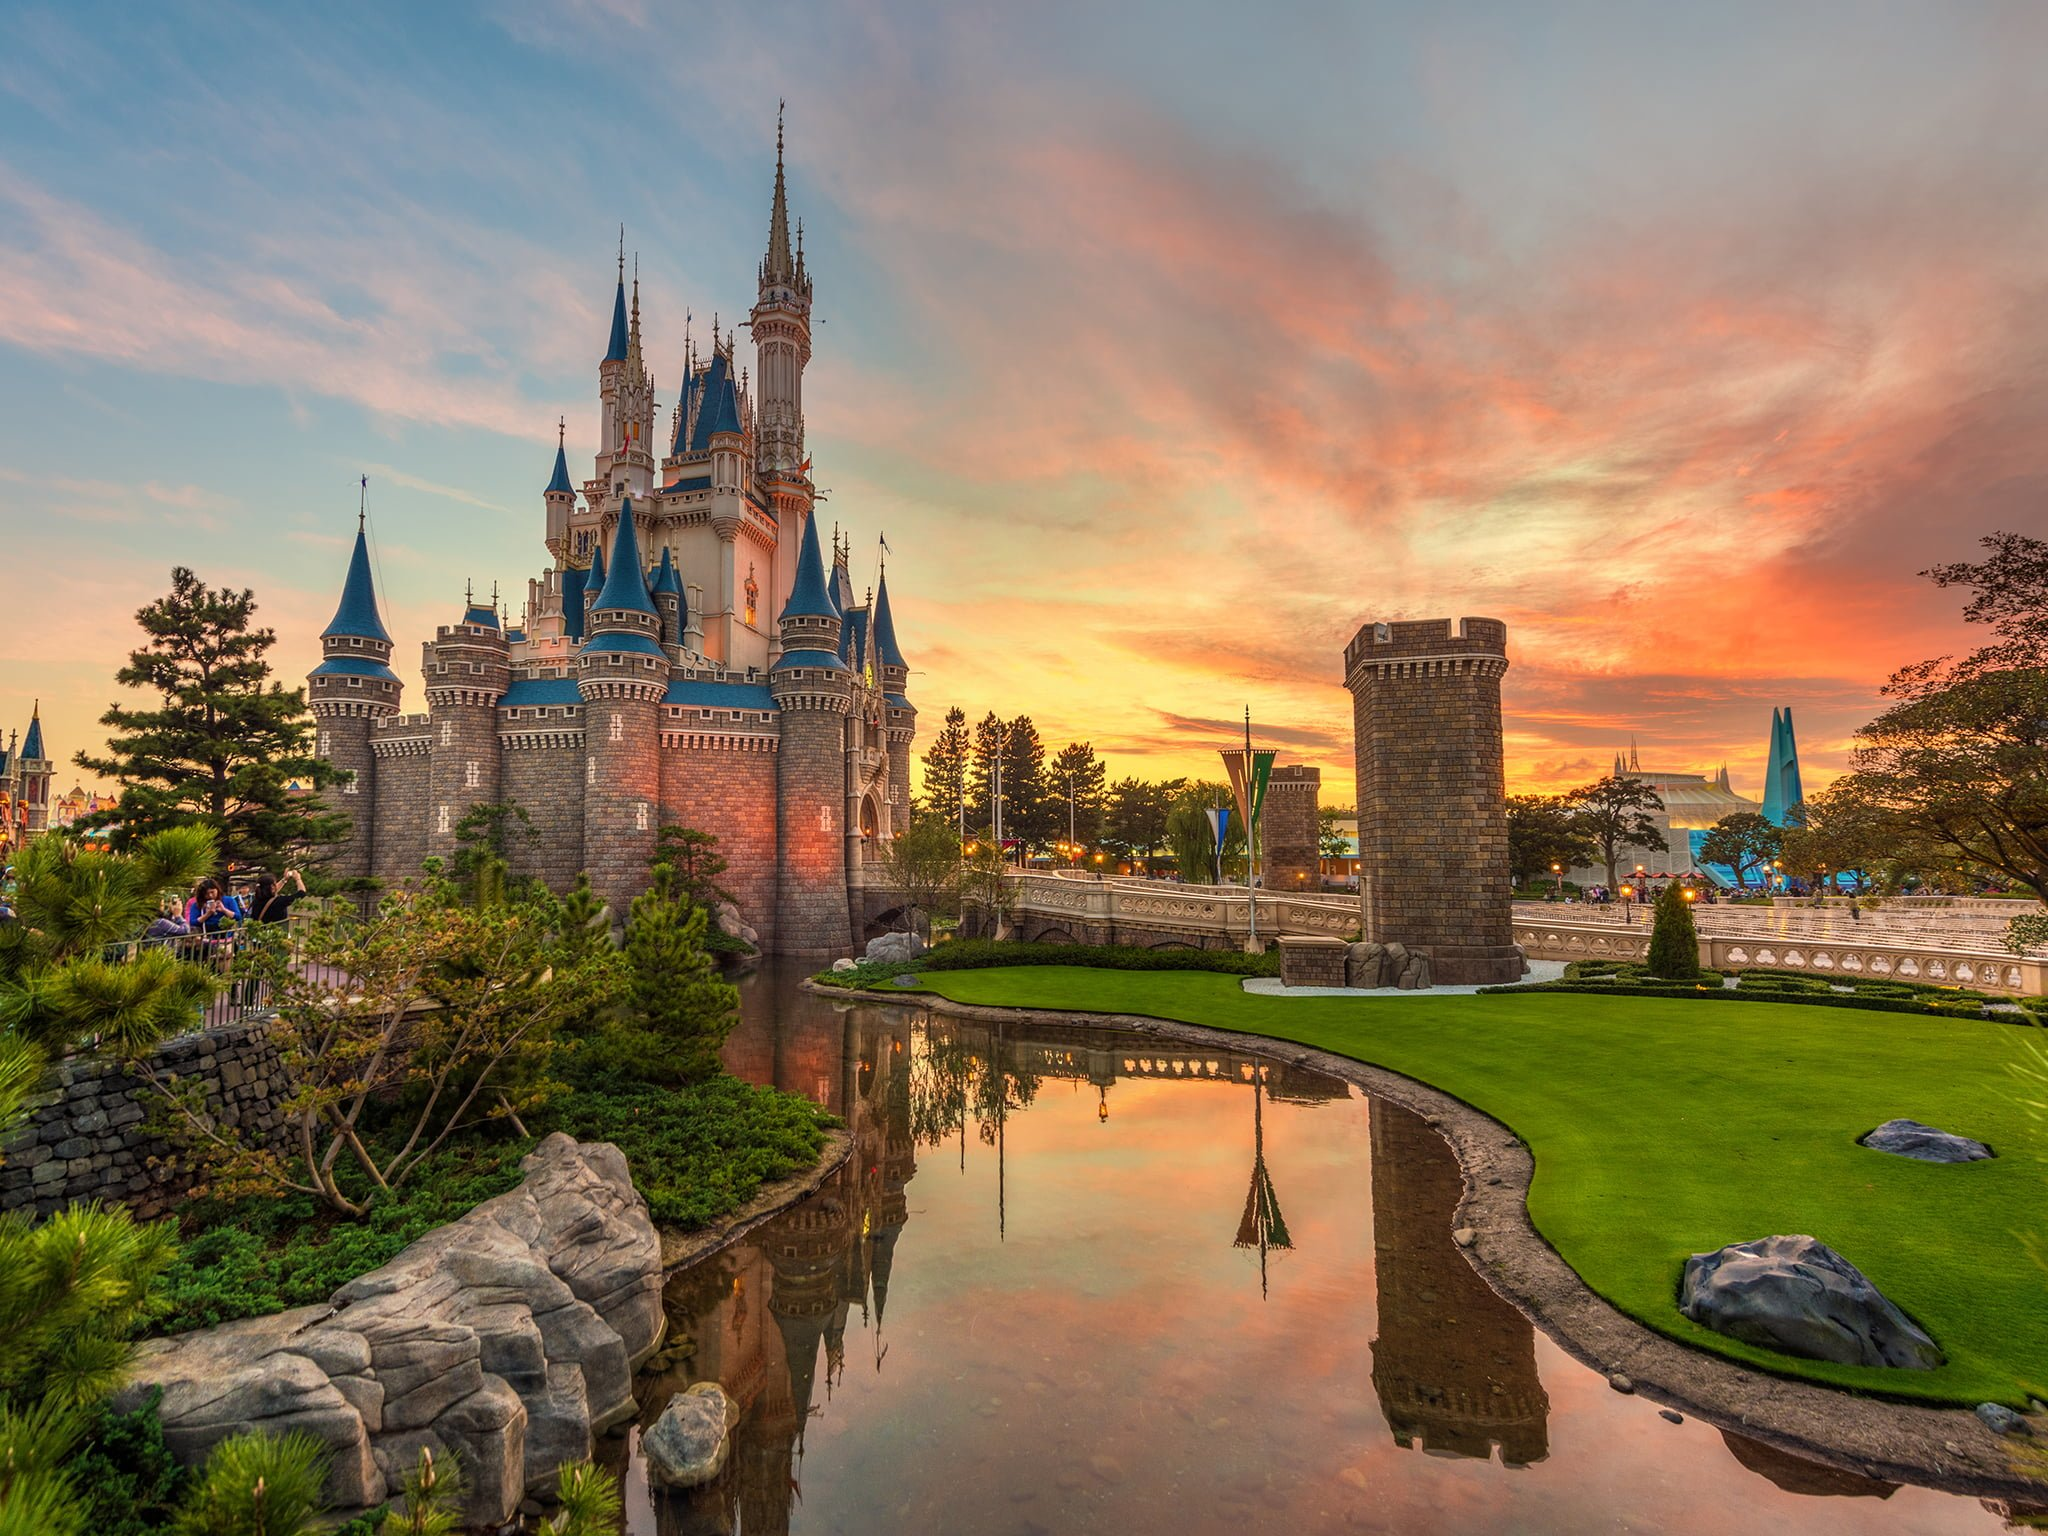 Walt Disney World Iphone Wallpaper Disney Parks Trip Planning Guides Disneytouristblog